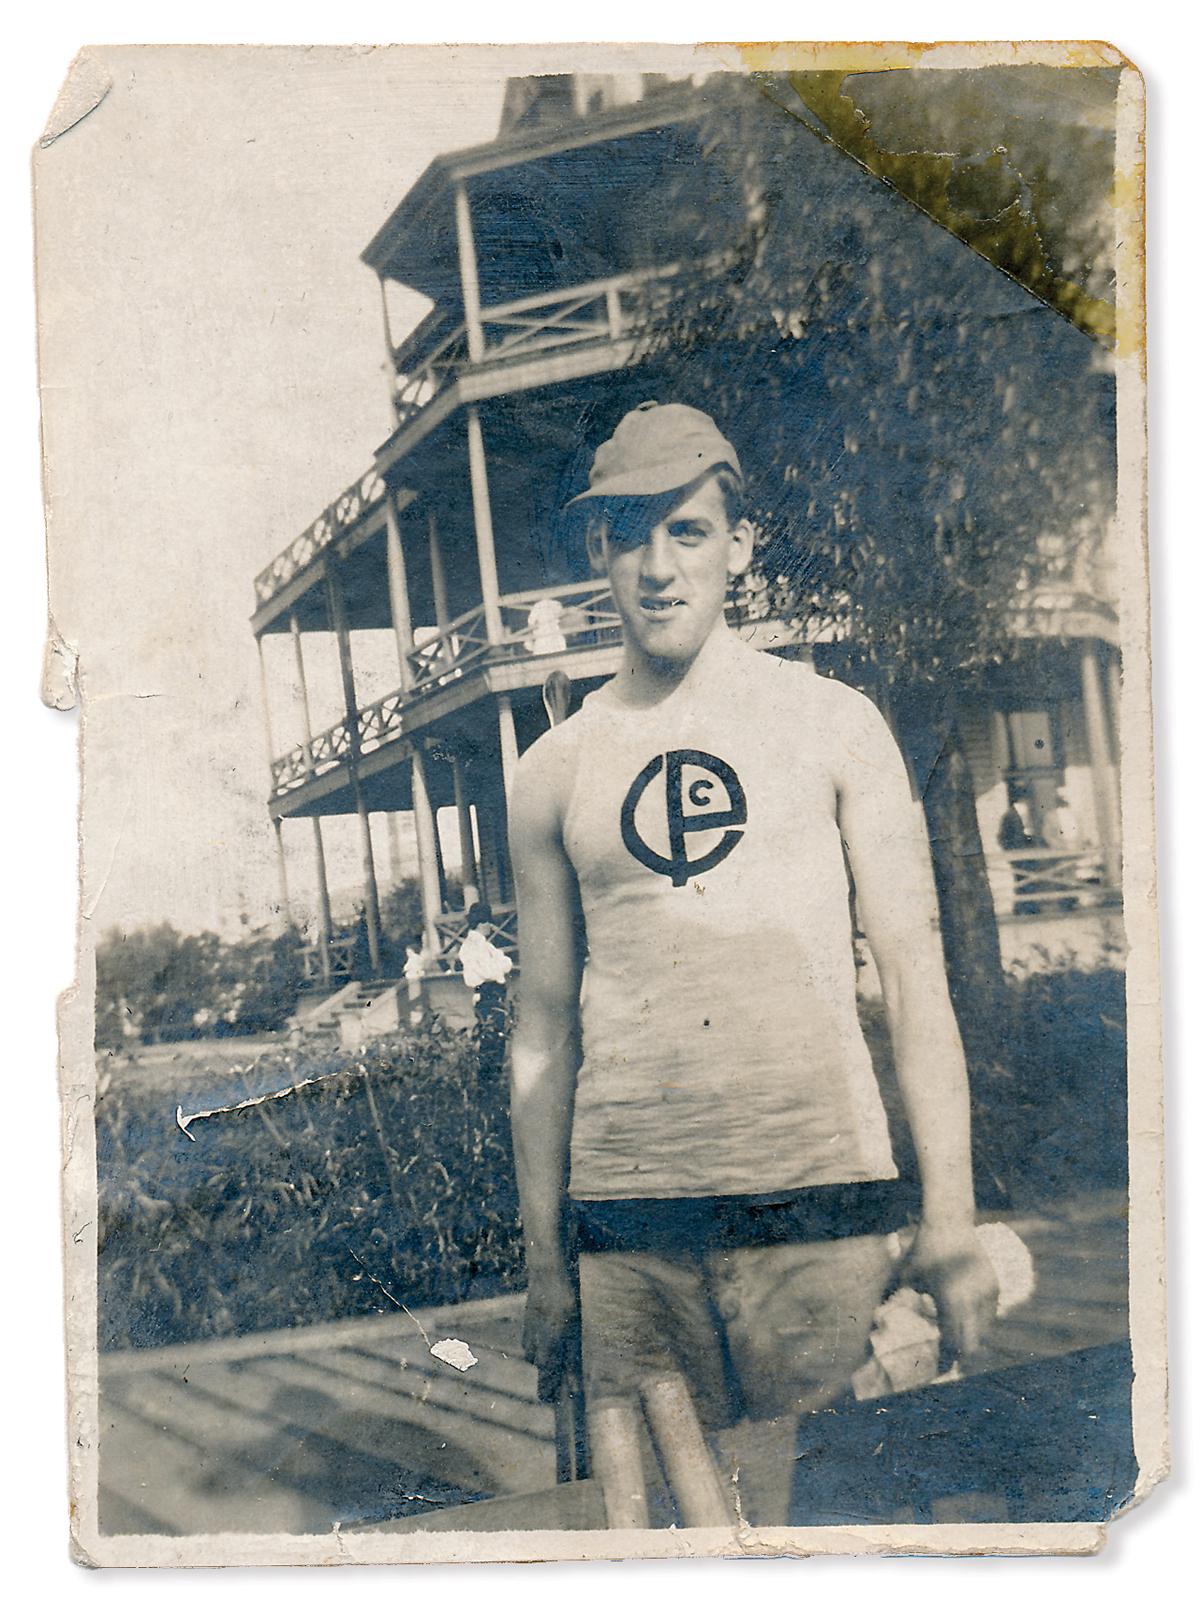 Photo of Lou Skuce, circa 1909